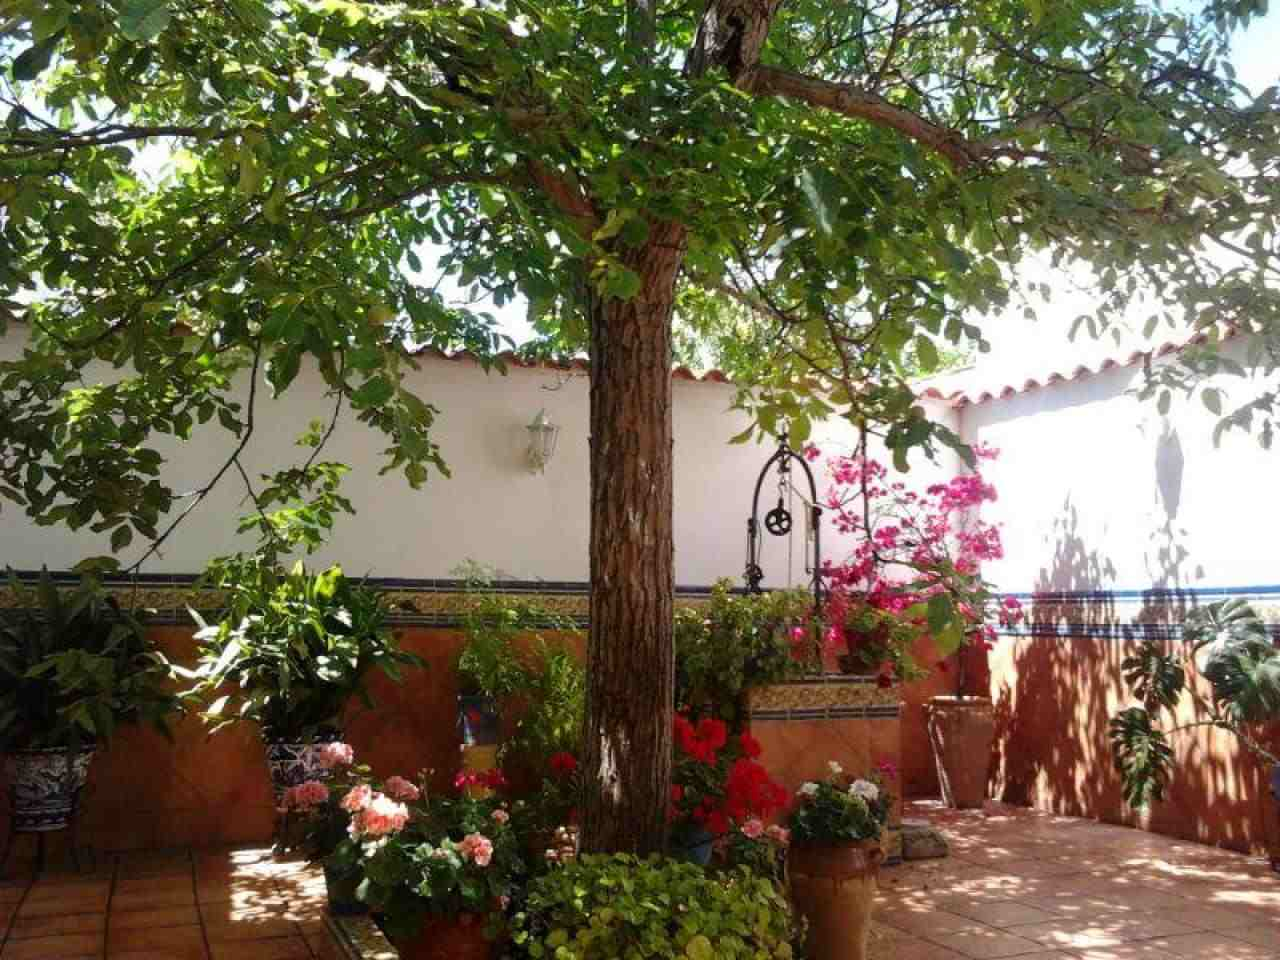 Alquiler vacacional en Belmez, Córdoba